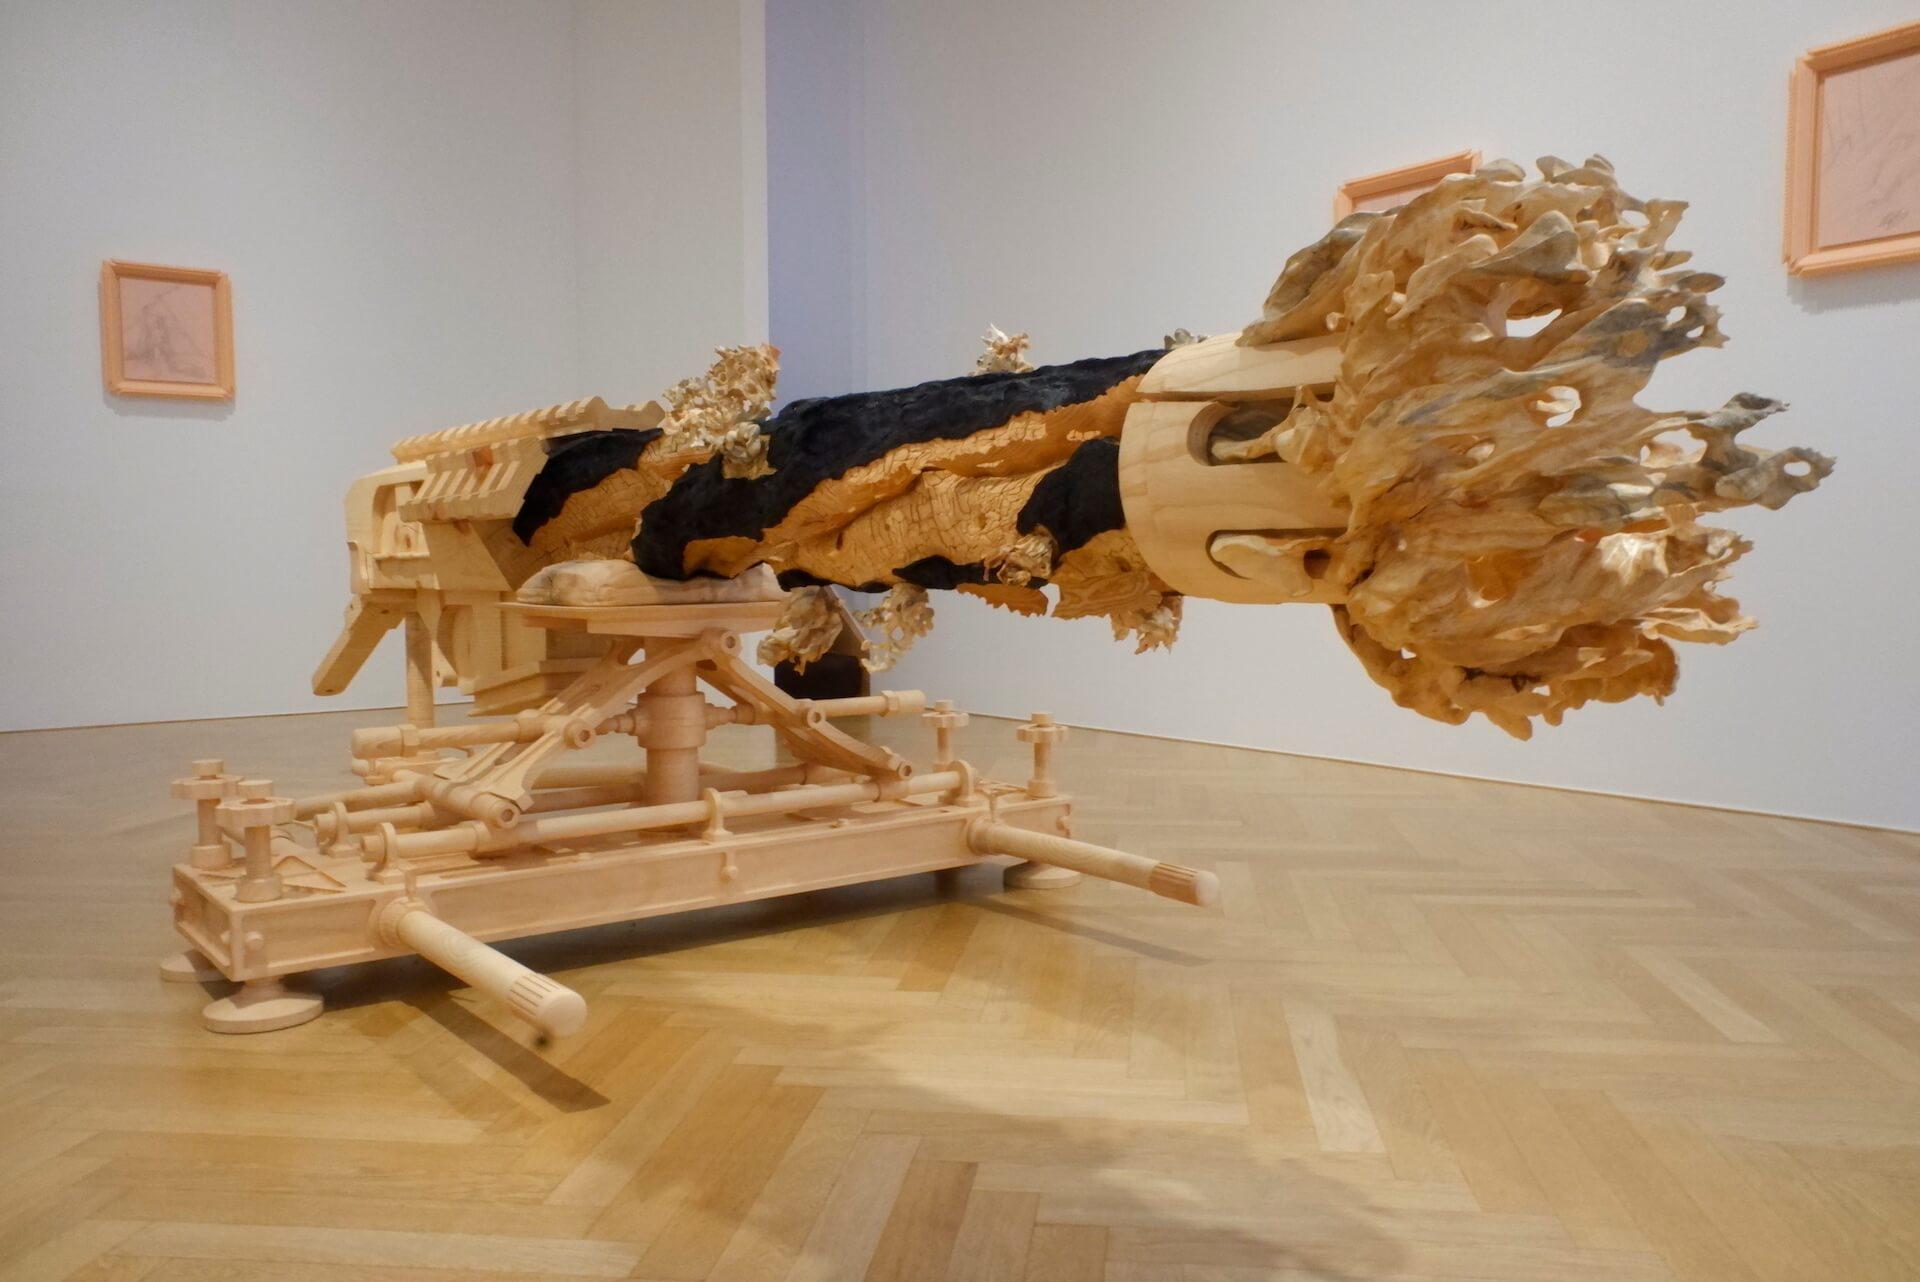 『Berlin Art Week』現地レポート 進化し変化し続けるベルリンのアートカルチャー column210929kana-miyazawa-05